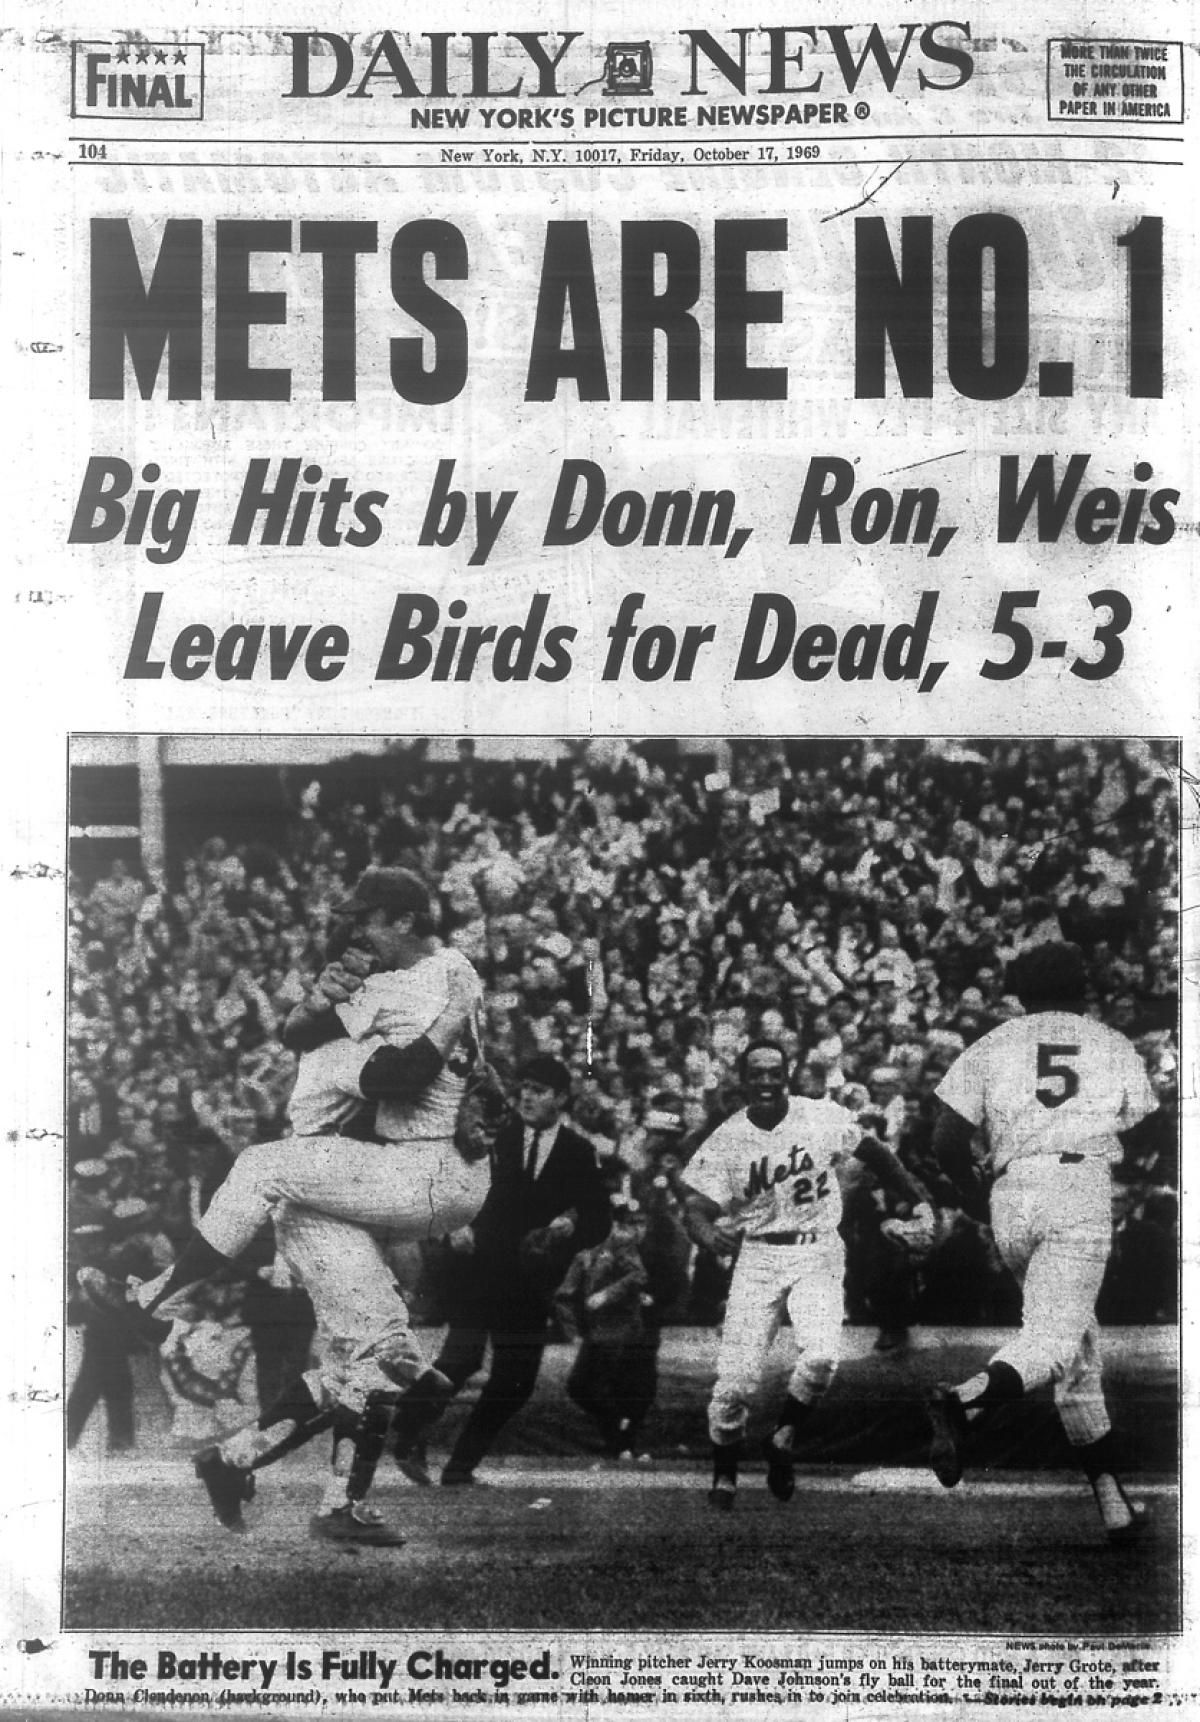 1969 World Series Game 5 Mets vs. Orioles Ny mets